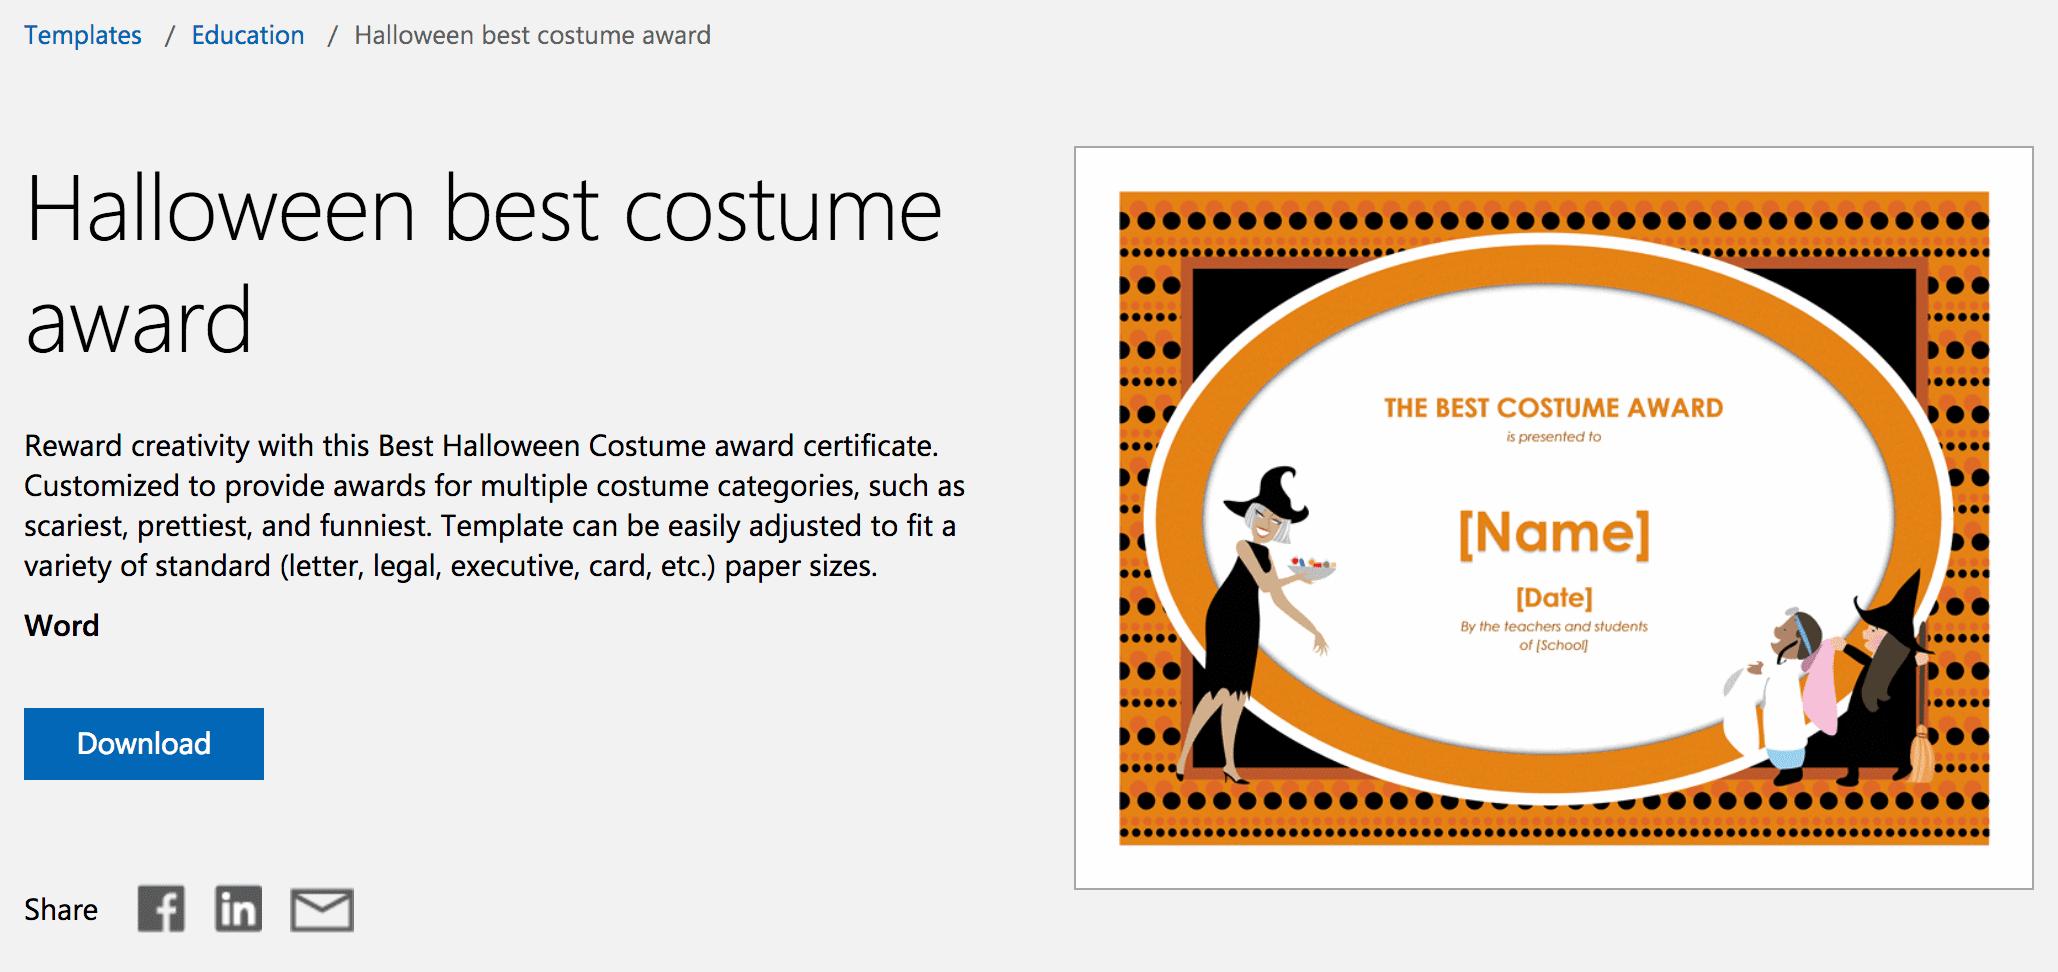 12 Free Halloween-Themed Templates For Microsoft Word - Free Printable Halloween Award Certificates